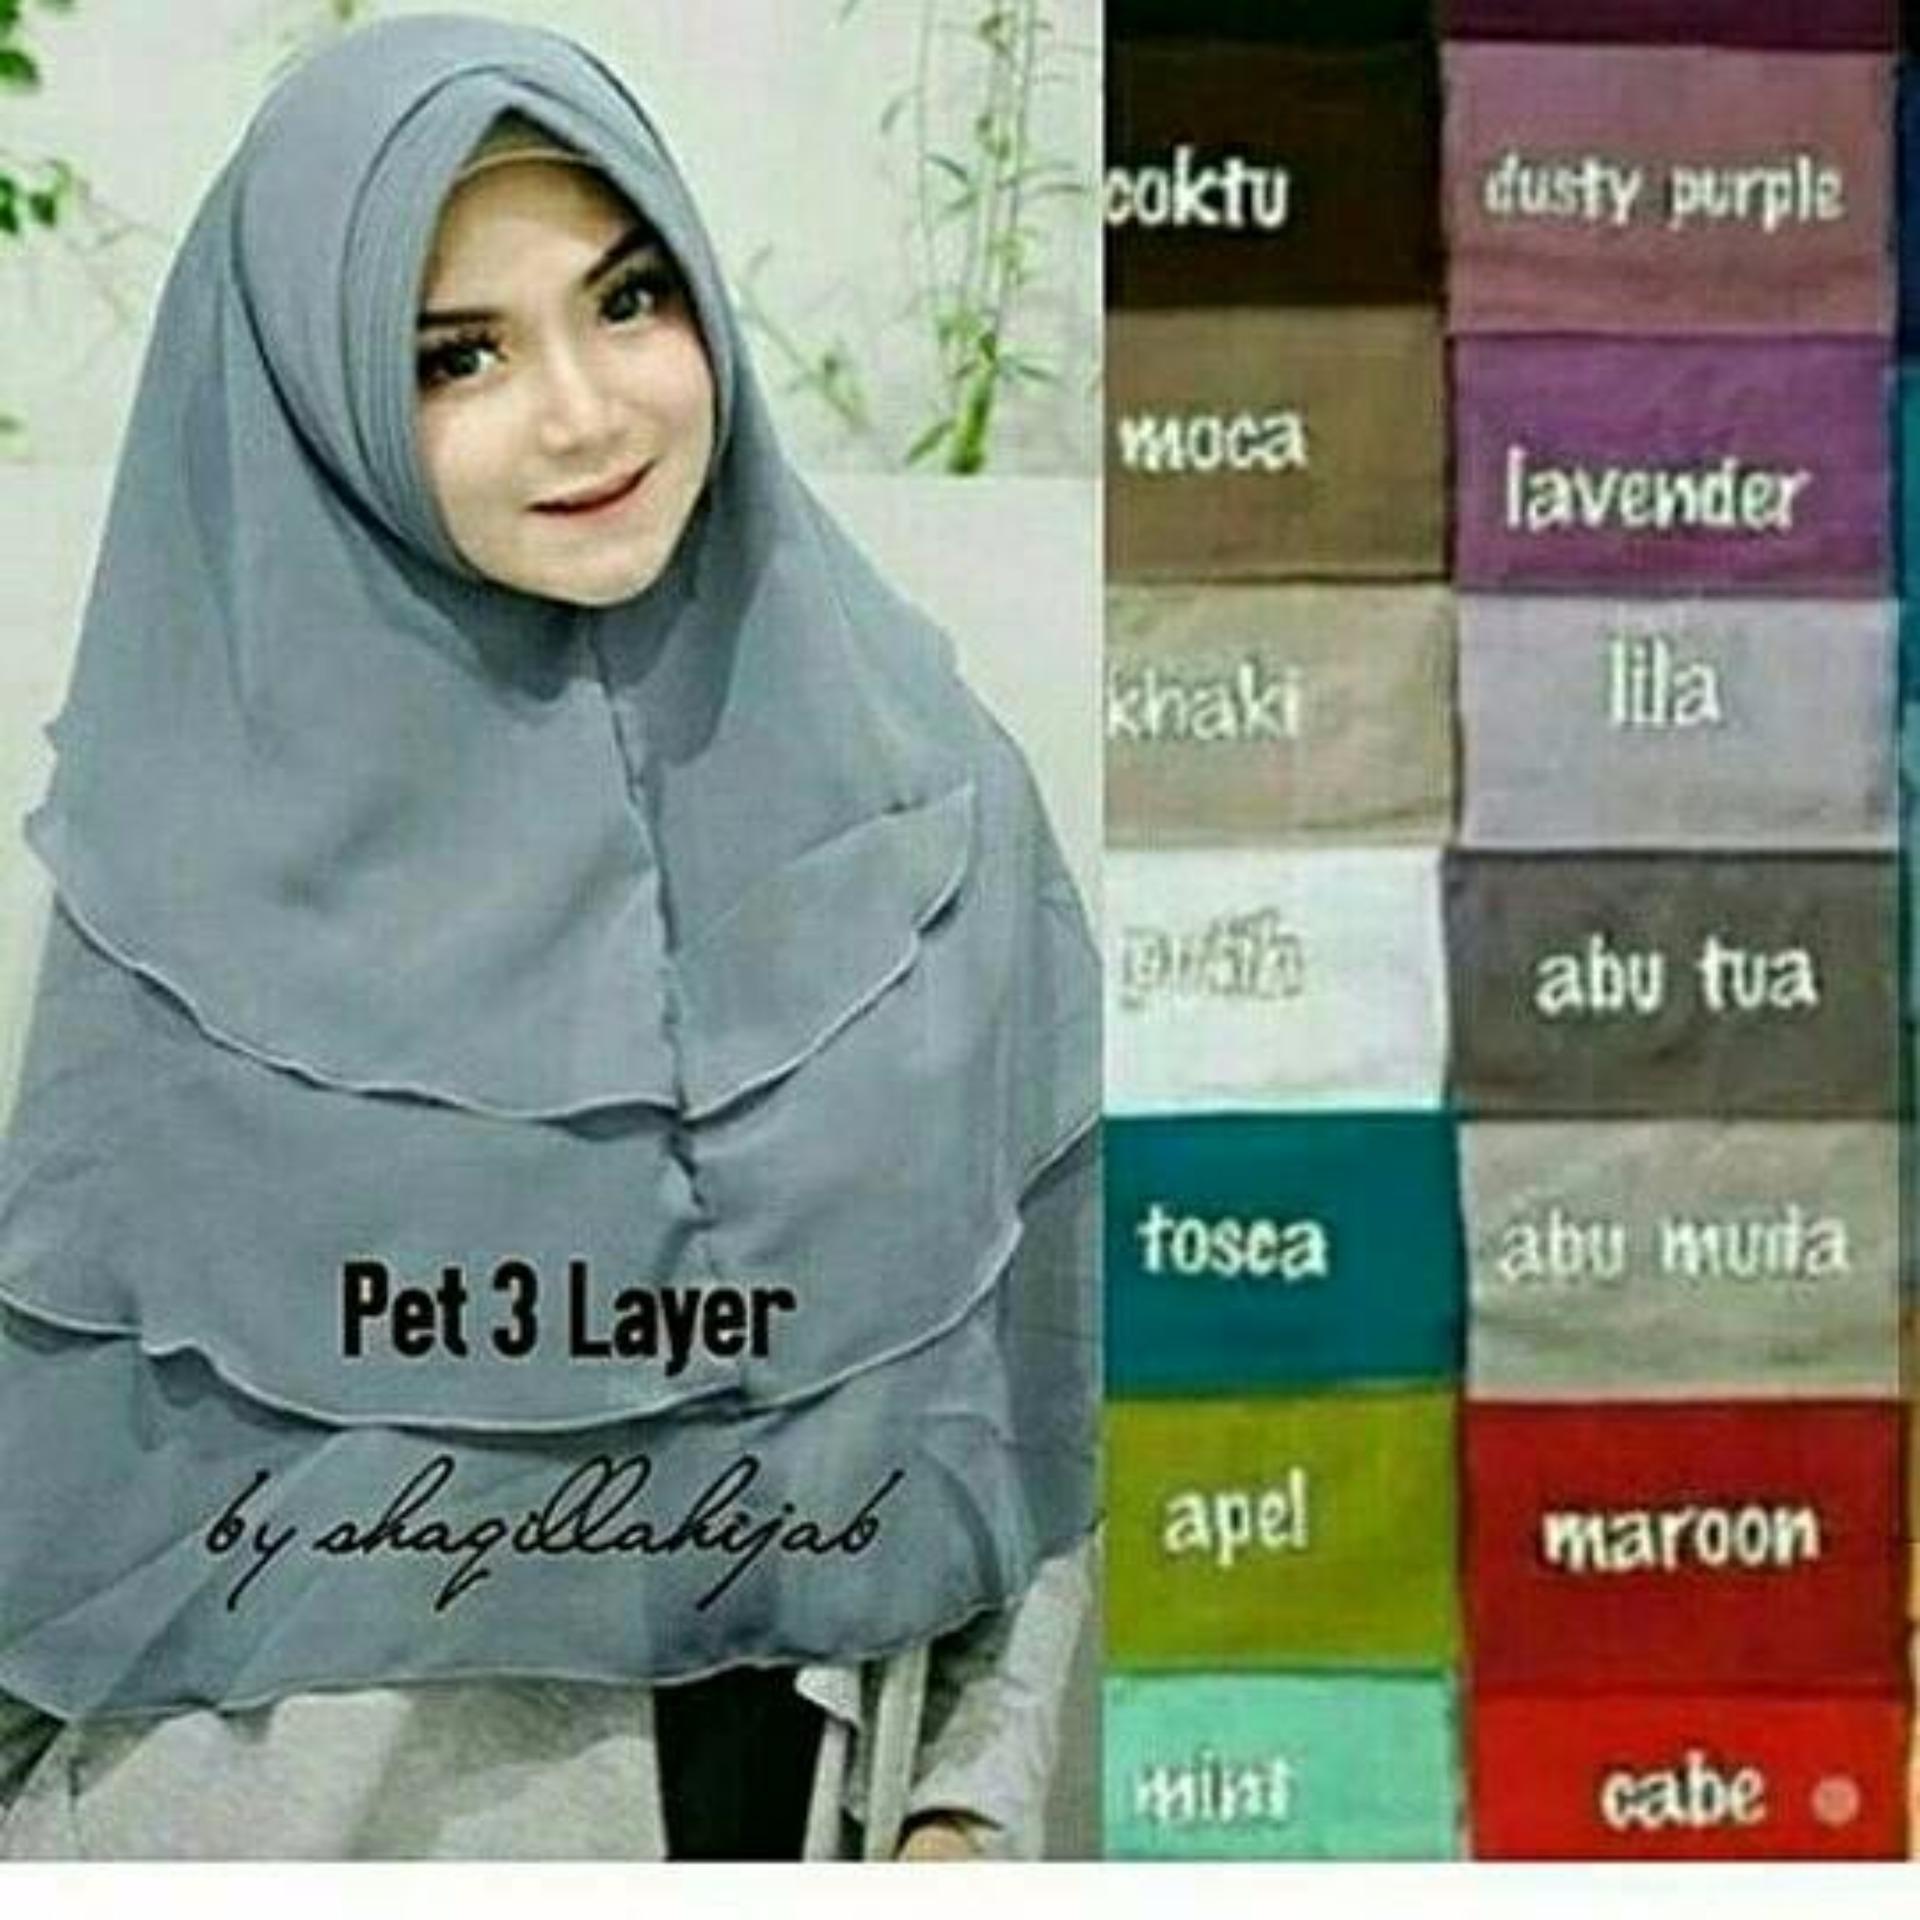 Hijab Instan Pita Pet Daftar Update Harga Terbaru Indonesia Jilbab Depan Flash Sale 3 Layers